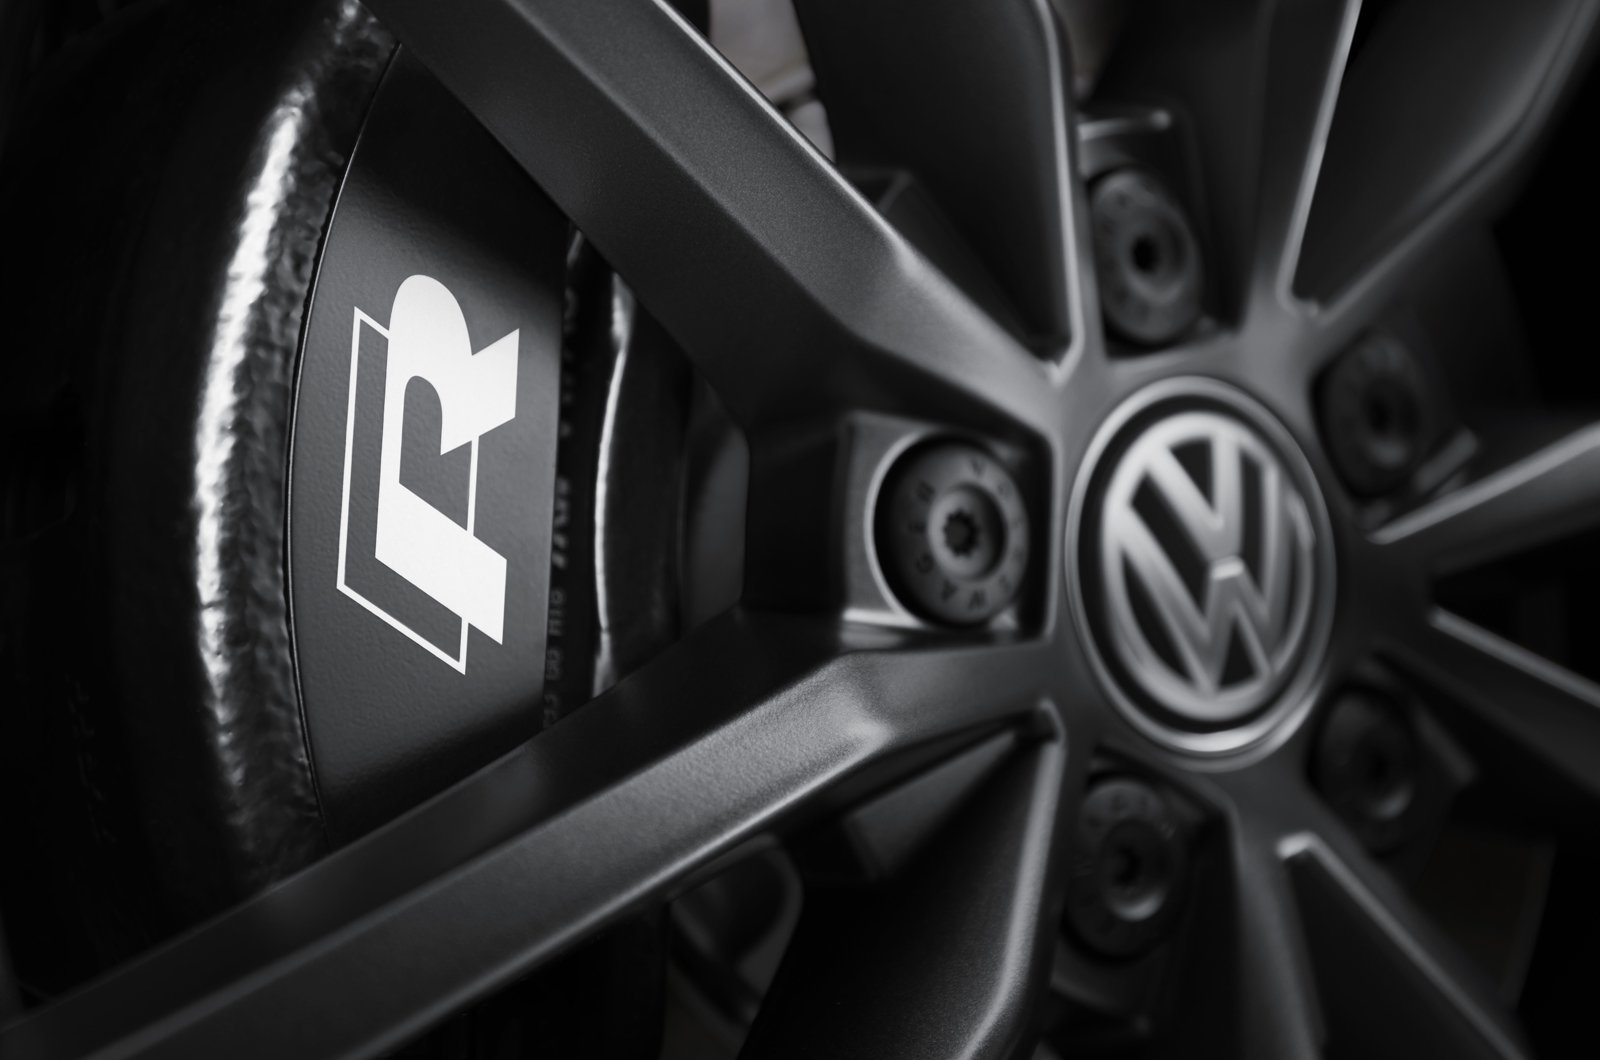 Volkswagen T-Roc R brake calliper